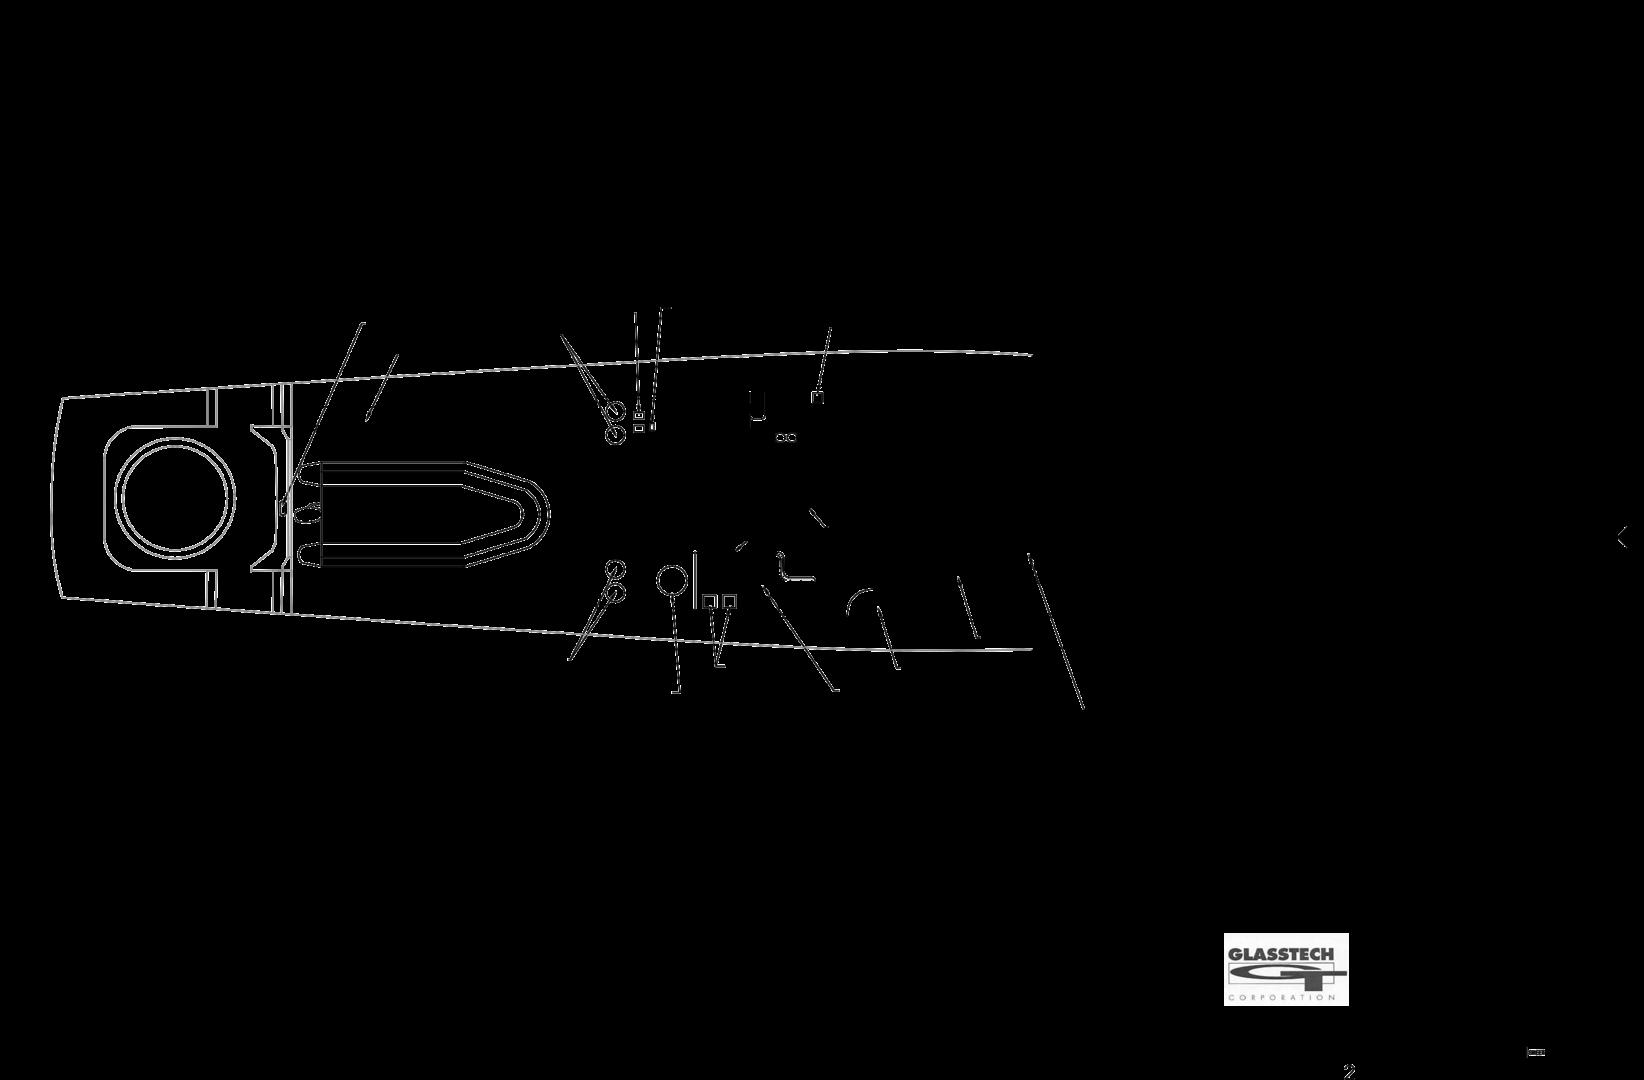 GlassTech 96 - Reset- General Arrangment